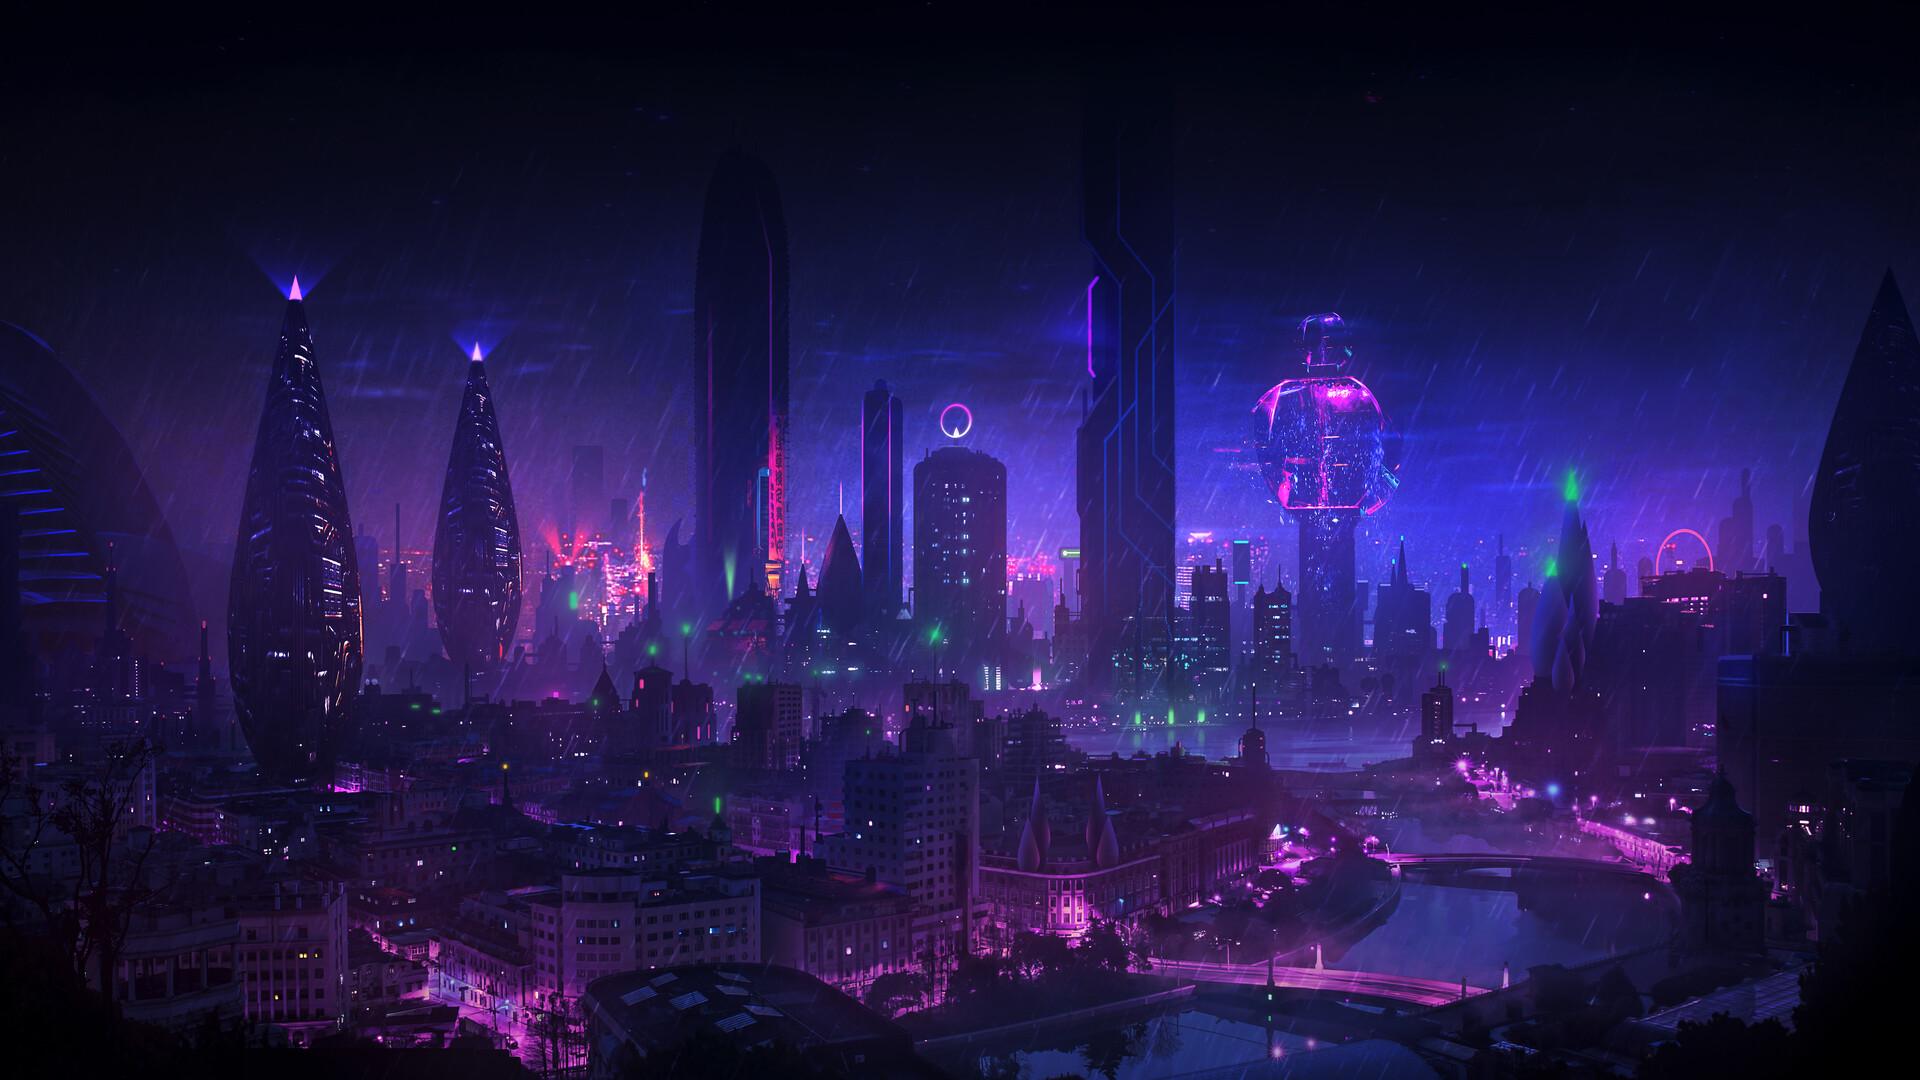 General 1920x1080 DominiqueVanVelsen cyberpunk city night rain neon glow cityscape purple bridge